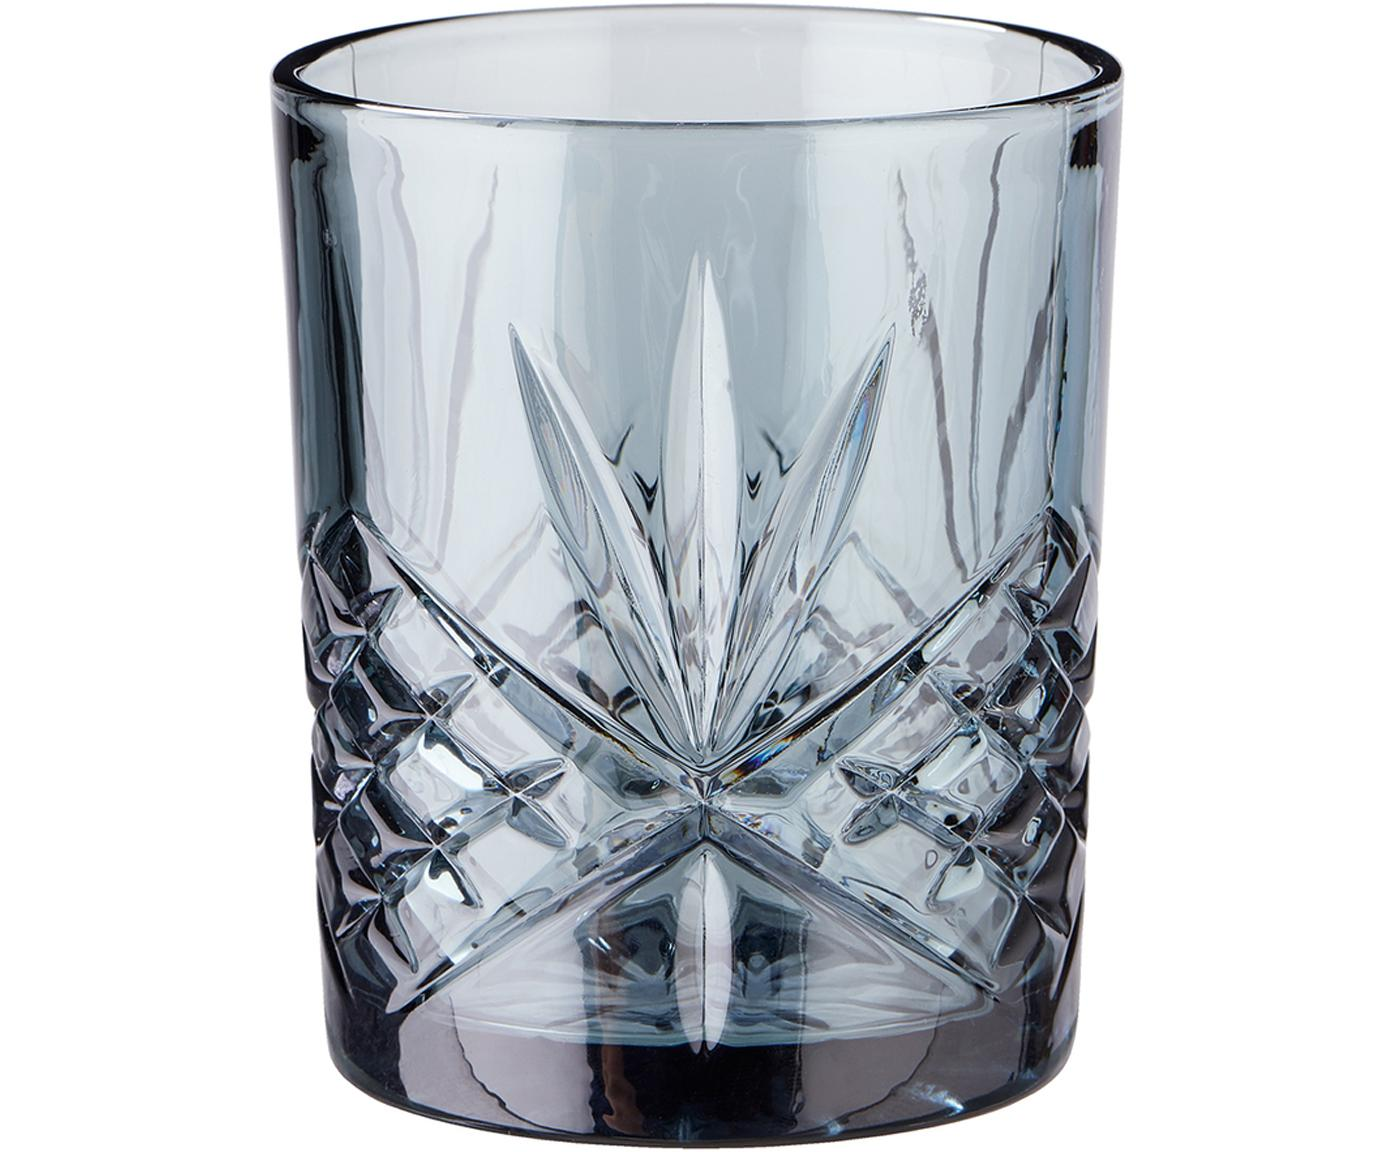 Glazen Crystal Club met kristalreliëf, 4-delig, Glas, Grijsblauw, Ø 8 cm